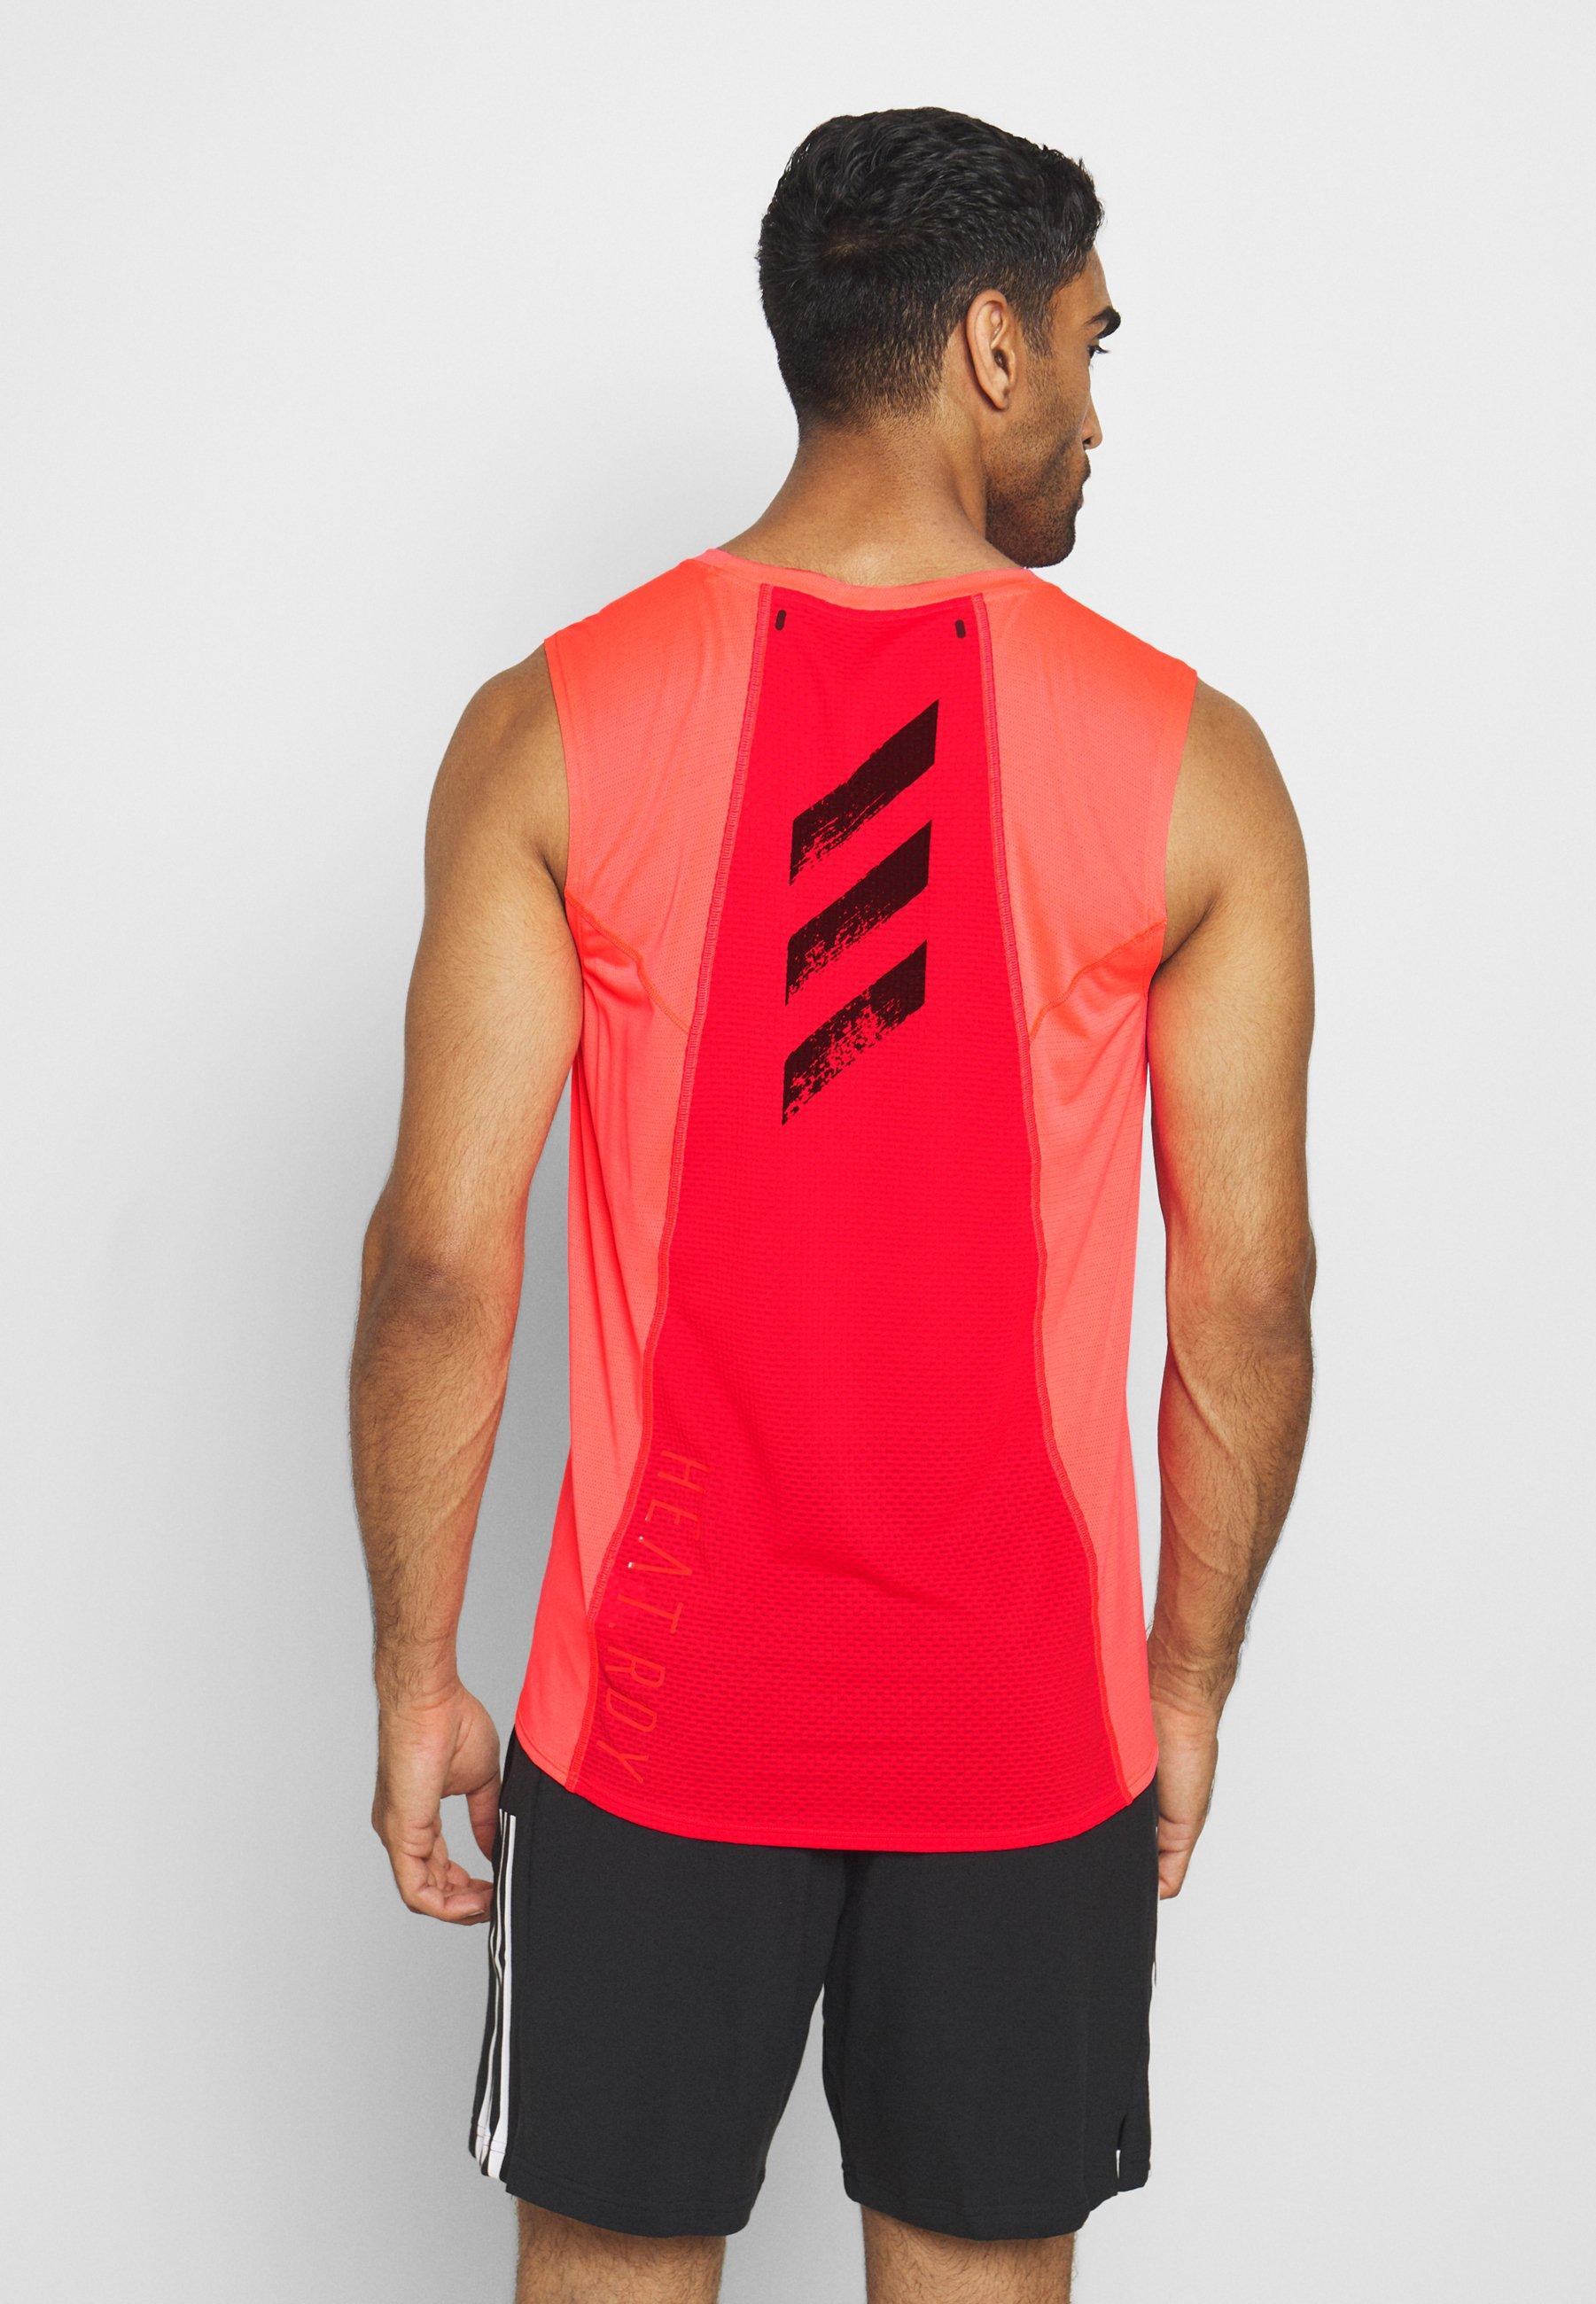 Barato Ropa de hombre adidas Performance ADIZERO HEAT.RDY SPORTS RUNNING SINGLET TANK Camiseta de deporte sigpnk 29QoaH